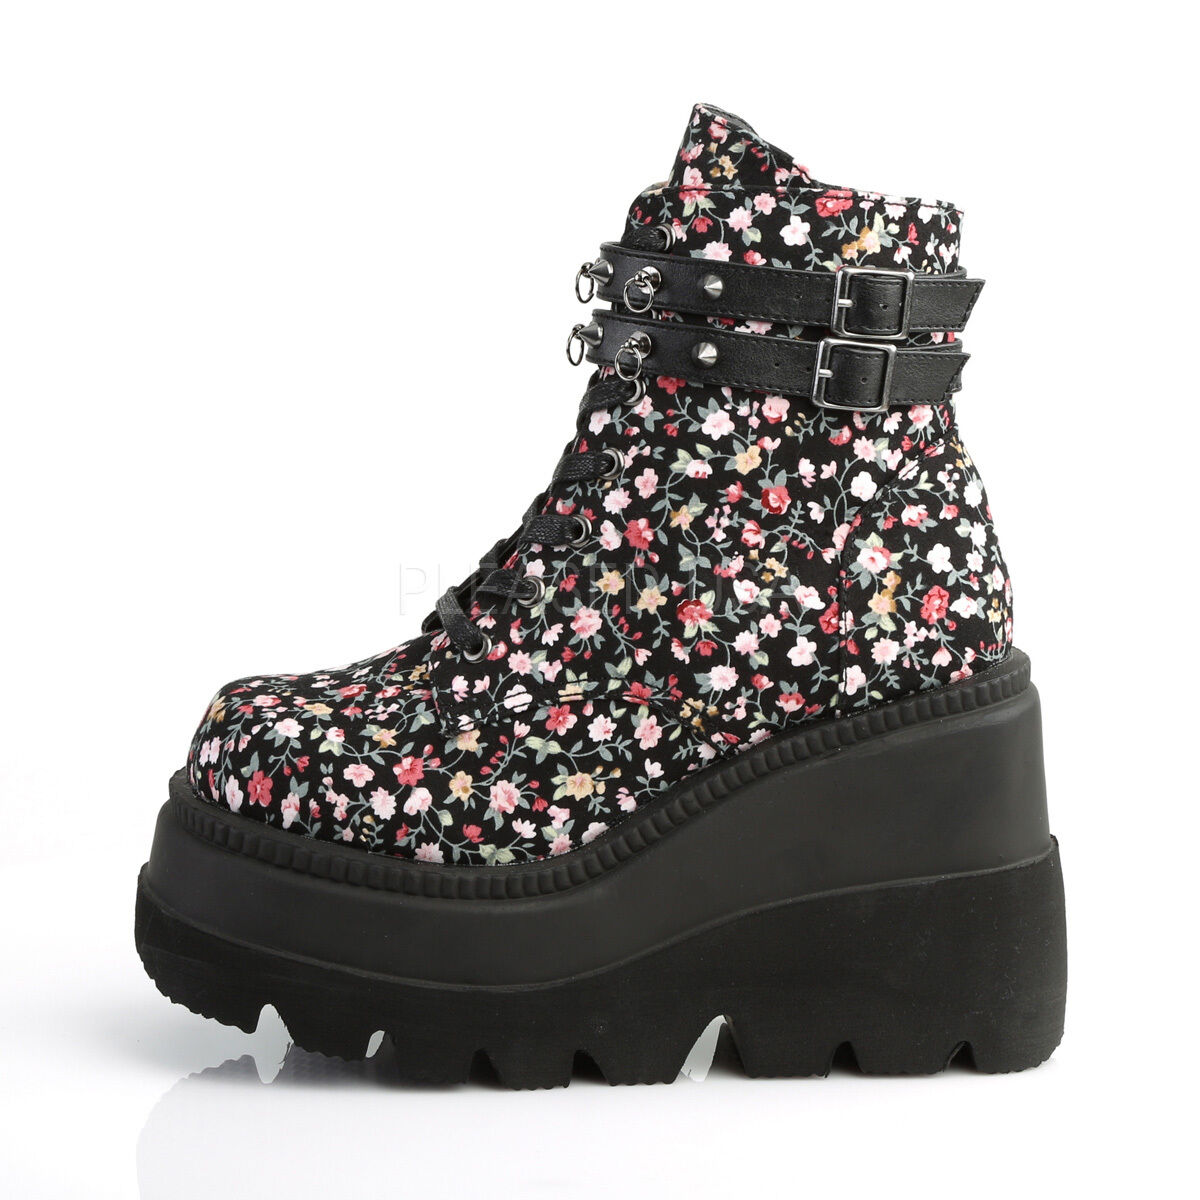 "Demonia Shaker Floral Platform 4.5"" Wedge Heel Ankle Boots Sizes 6-12"